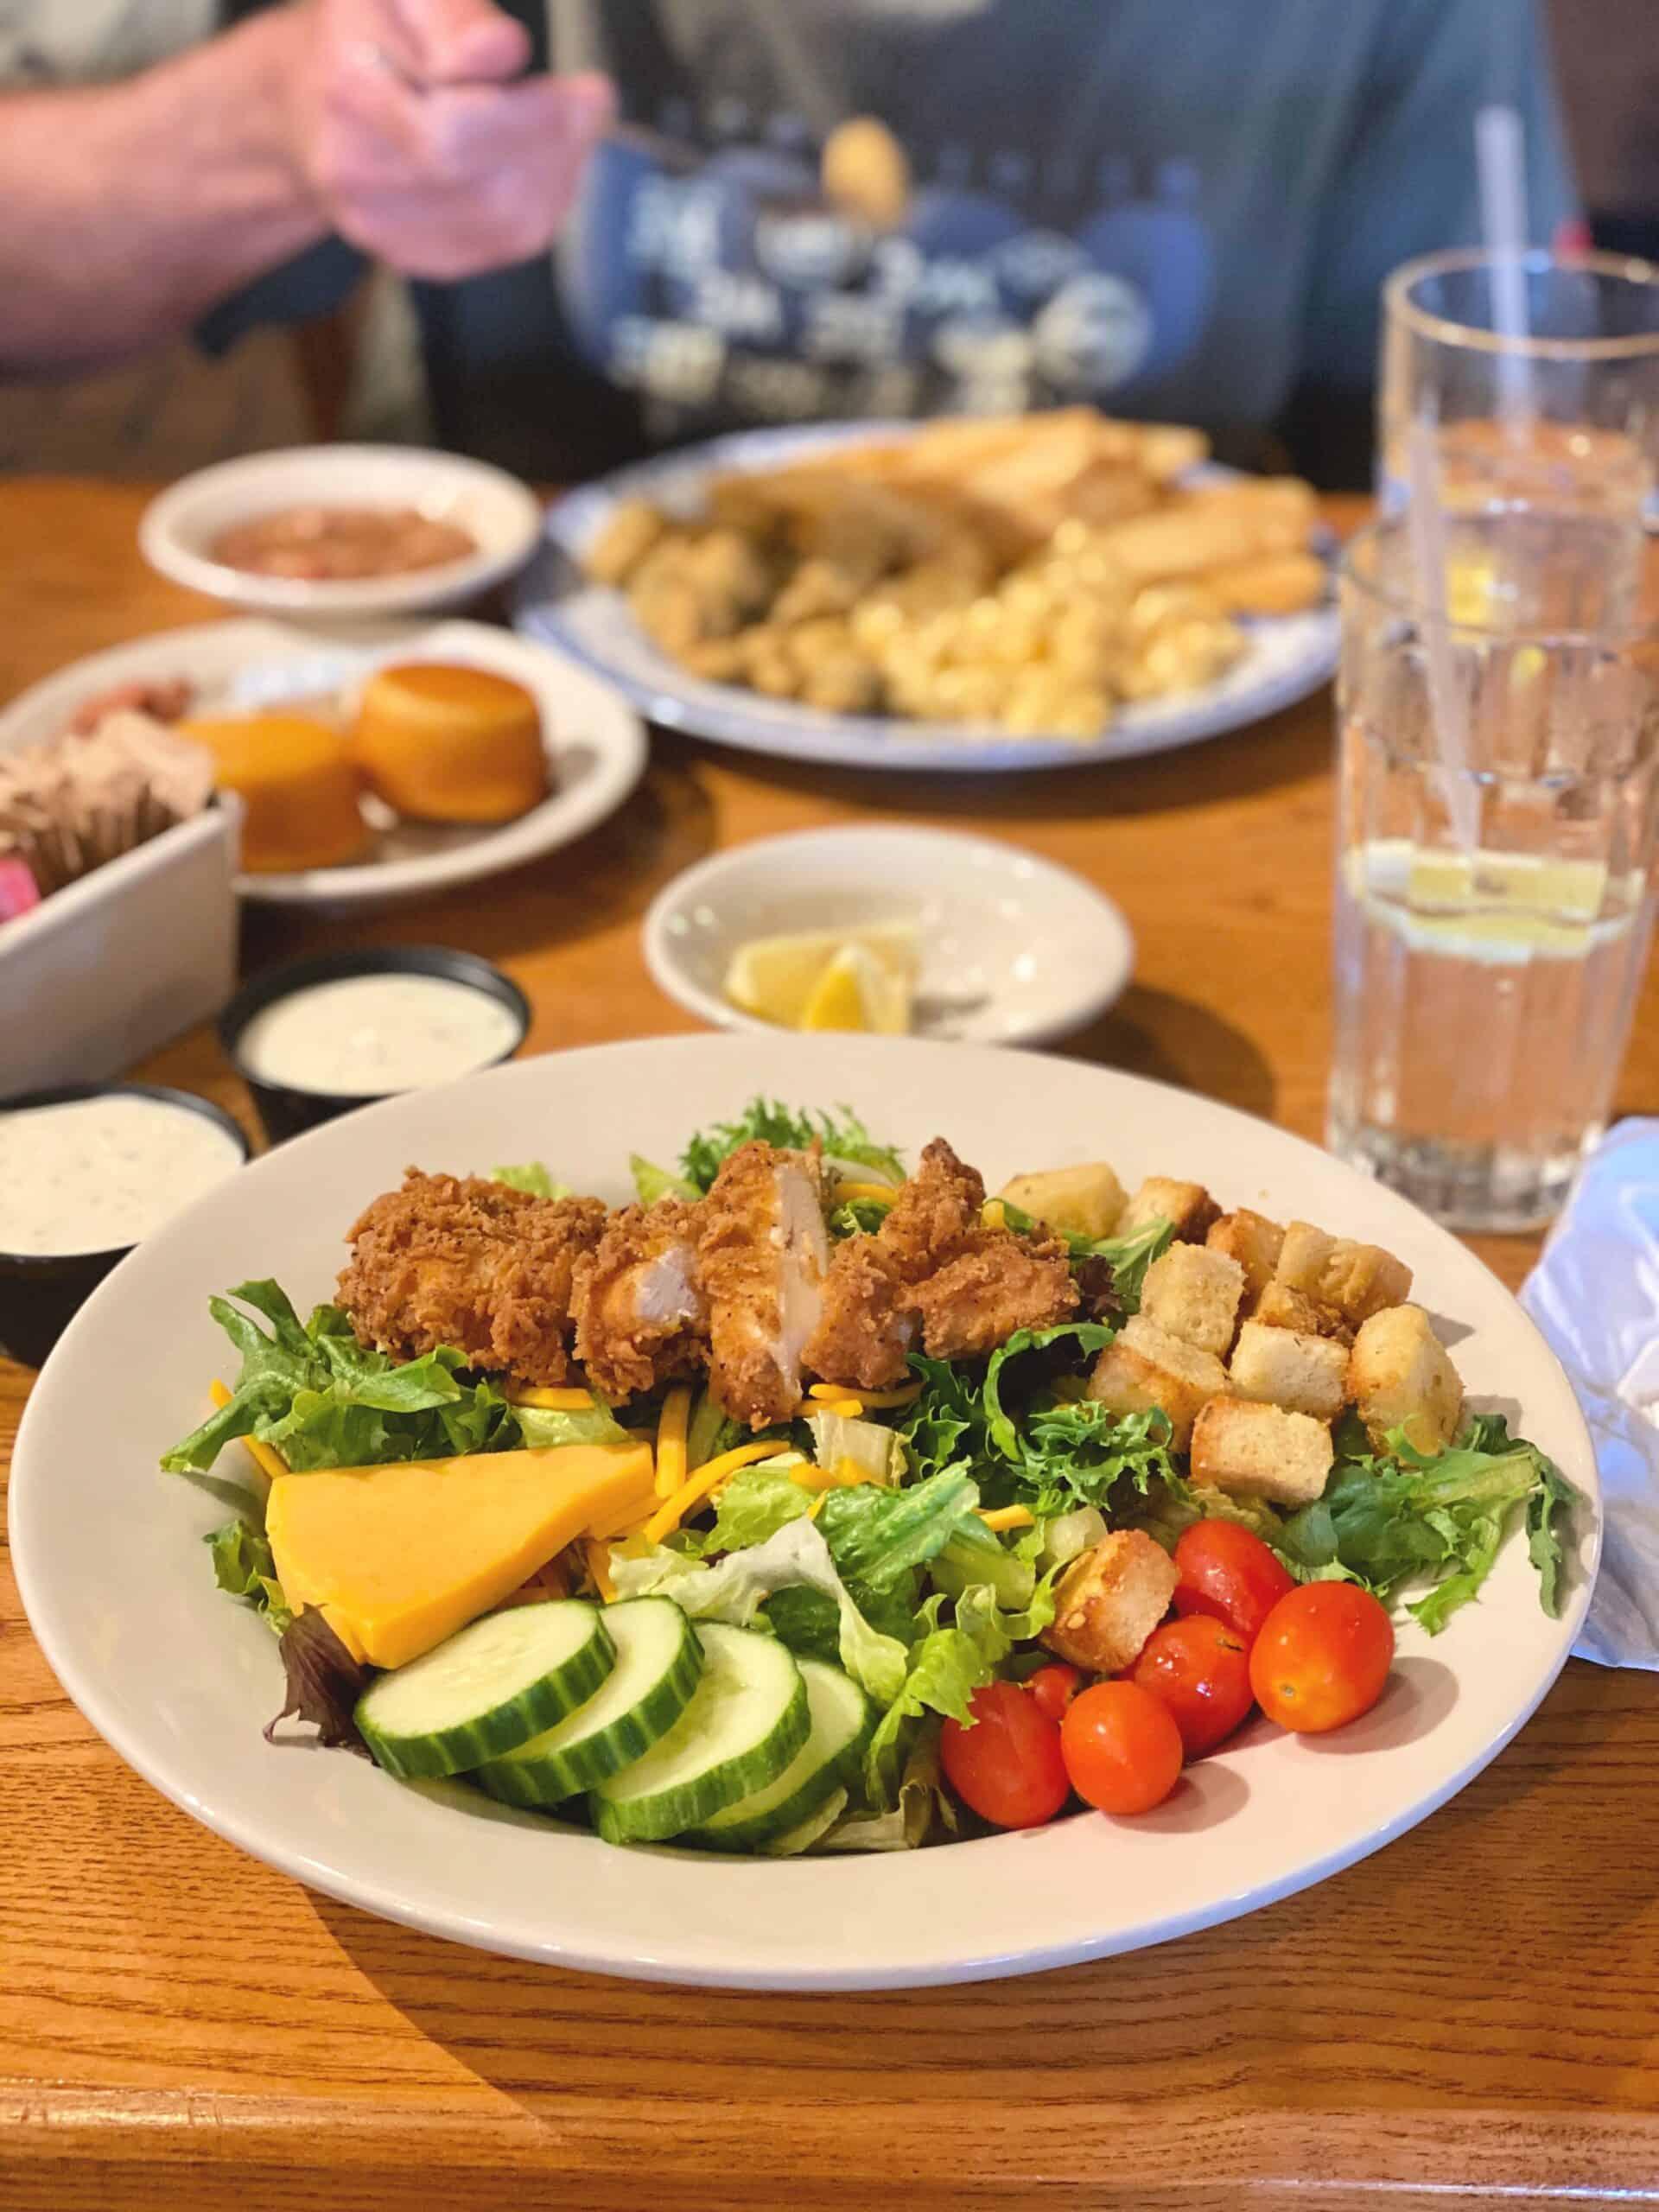 Homestyle Chicken Salad at Cracker Barrel